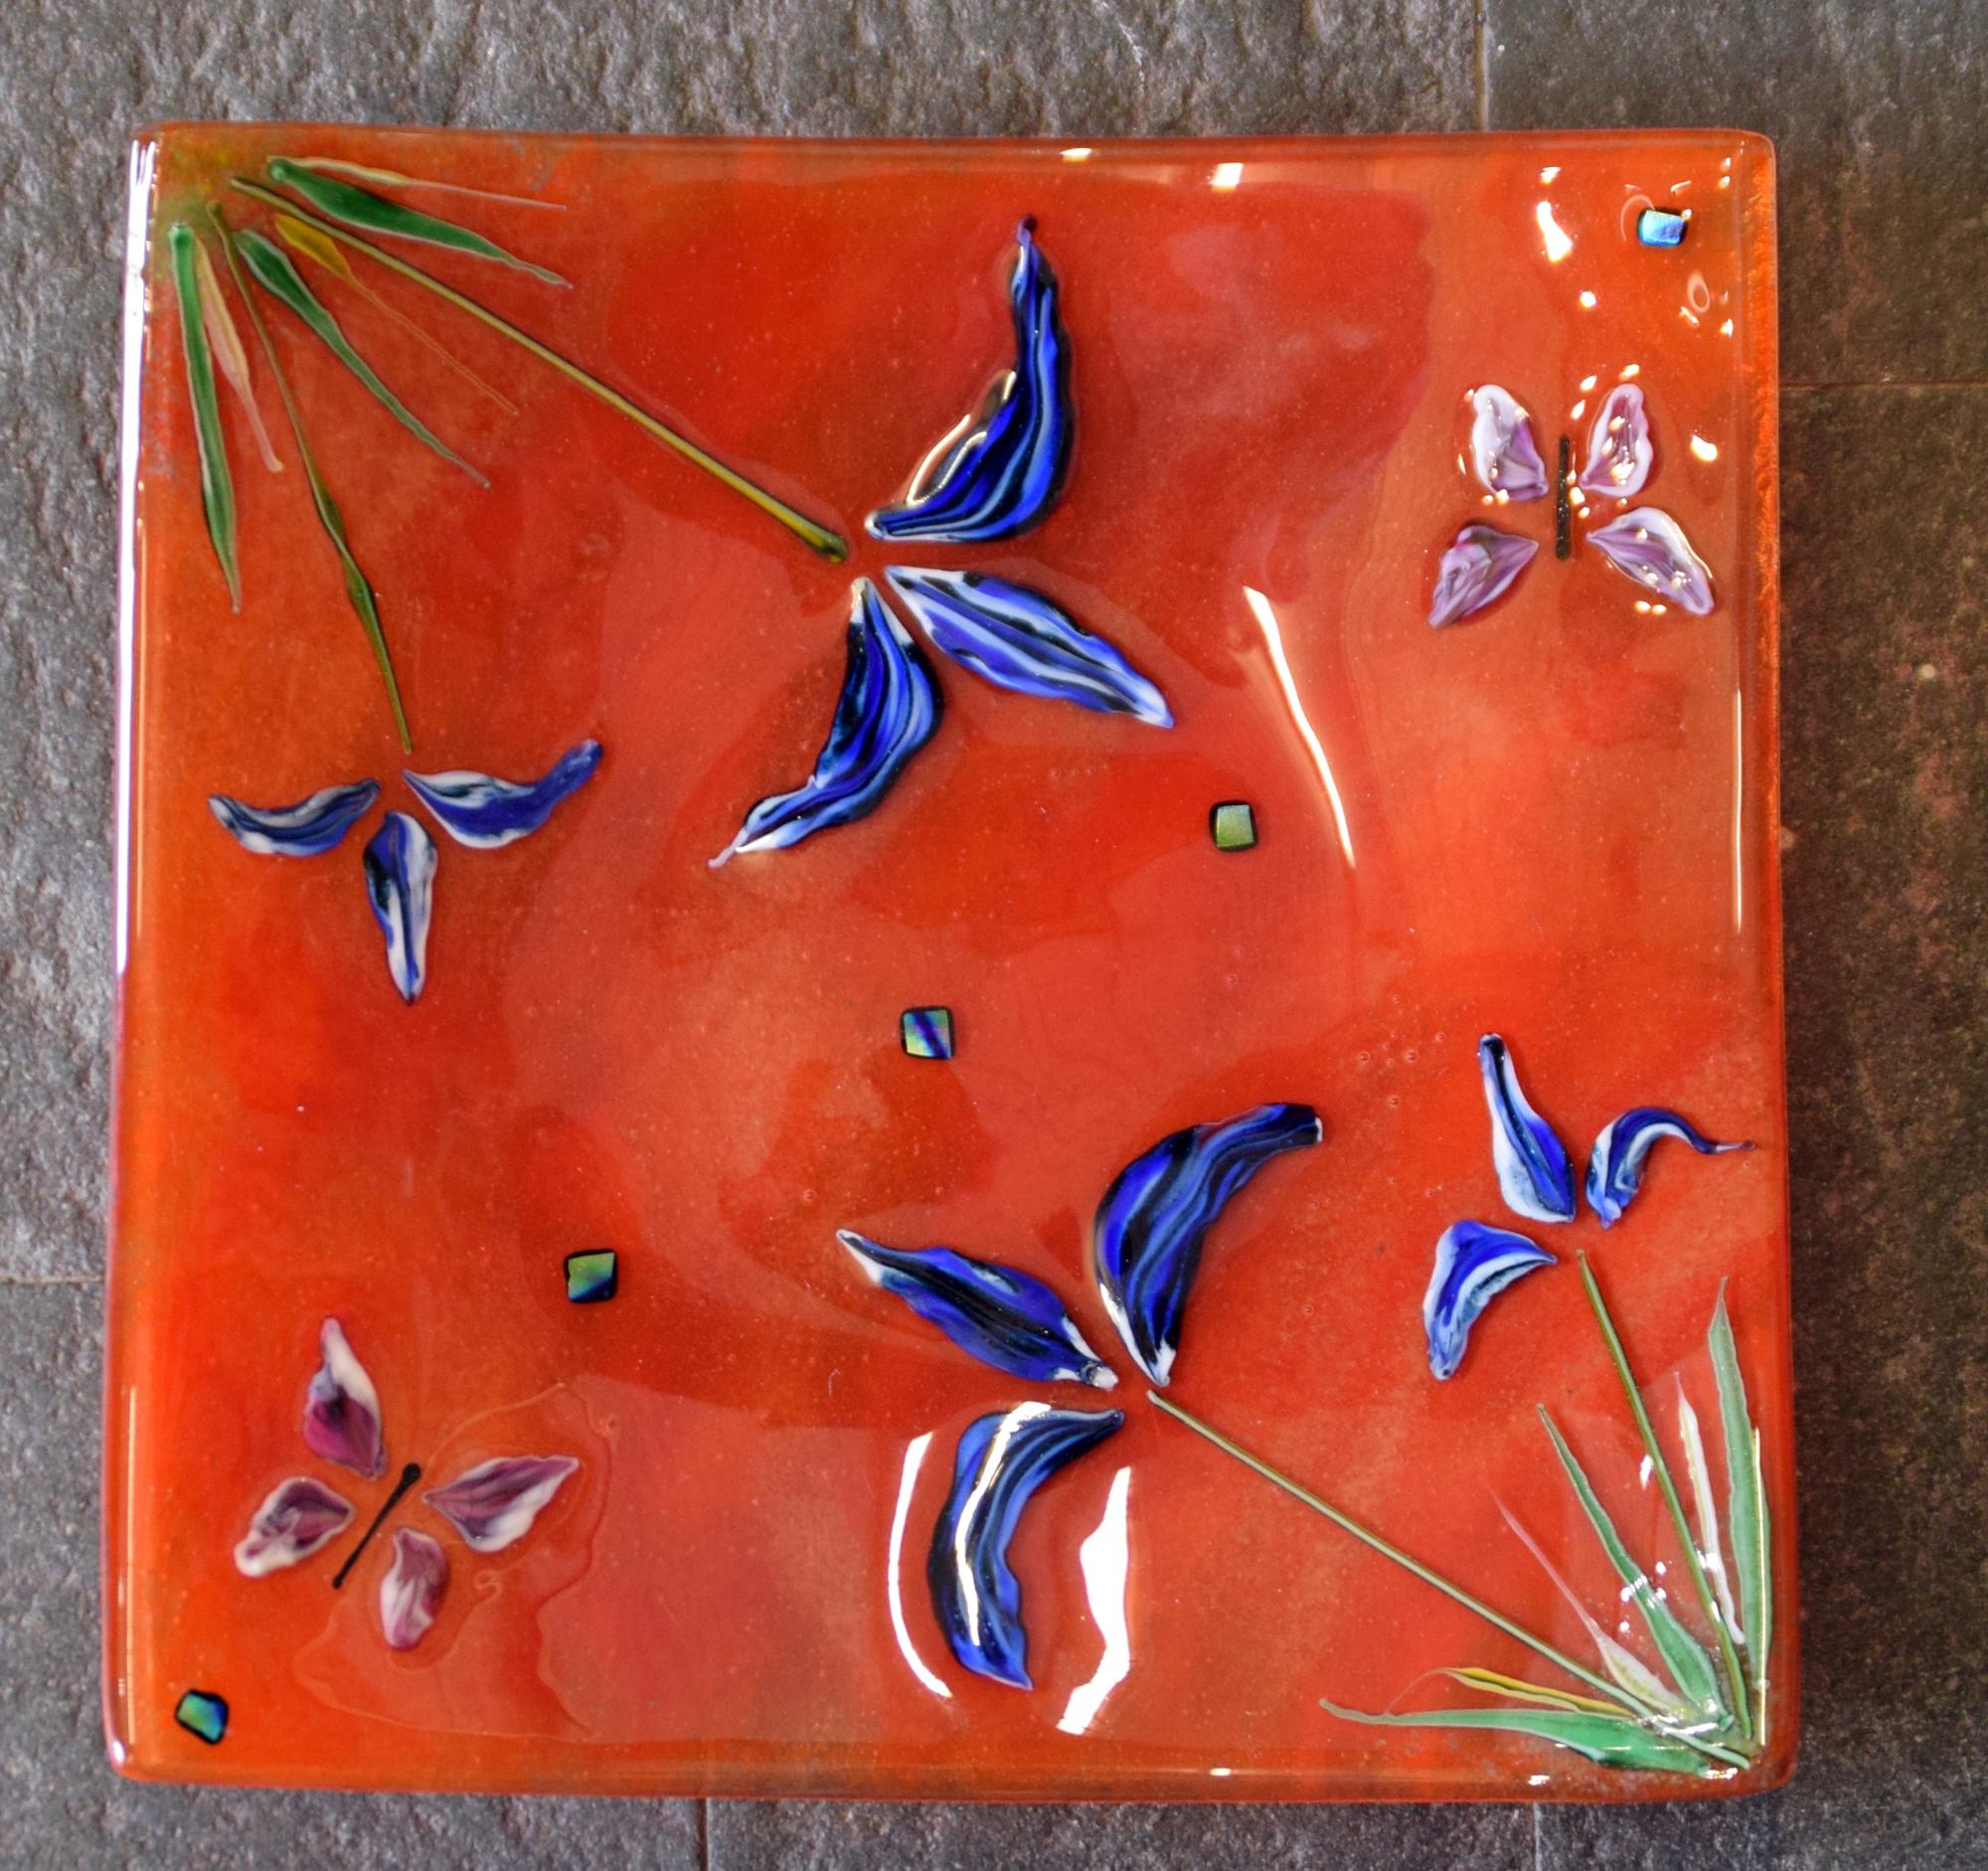 Fused glass plate in orange